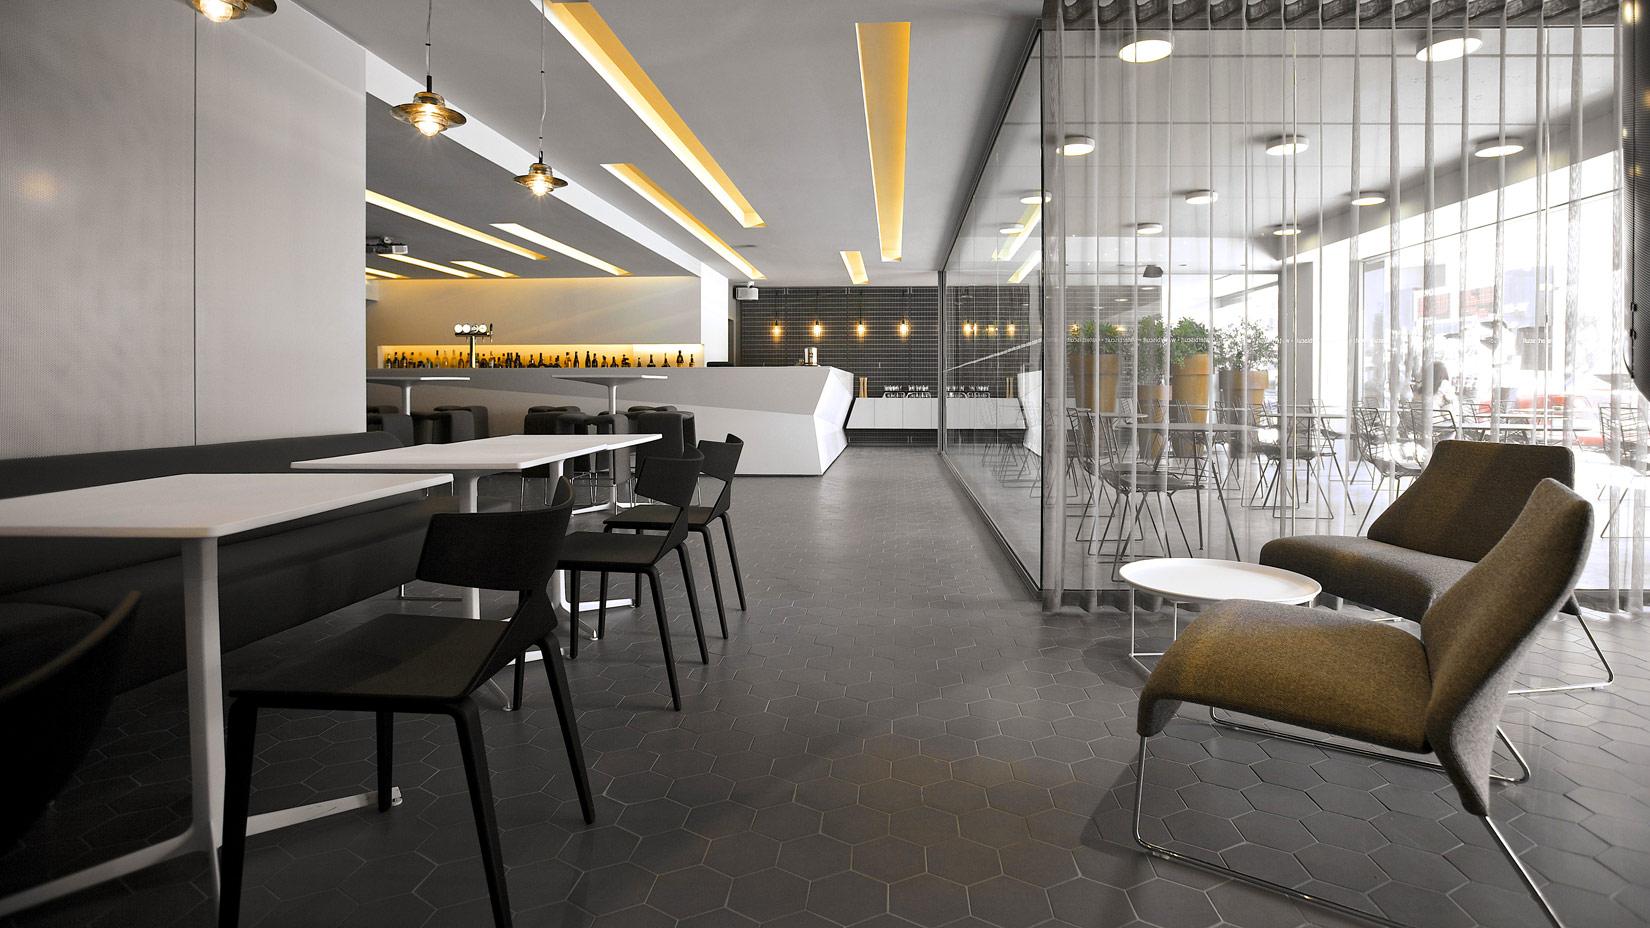 Waterbiscuit Restaurant at the Intercontinental Malta